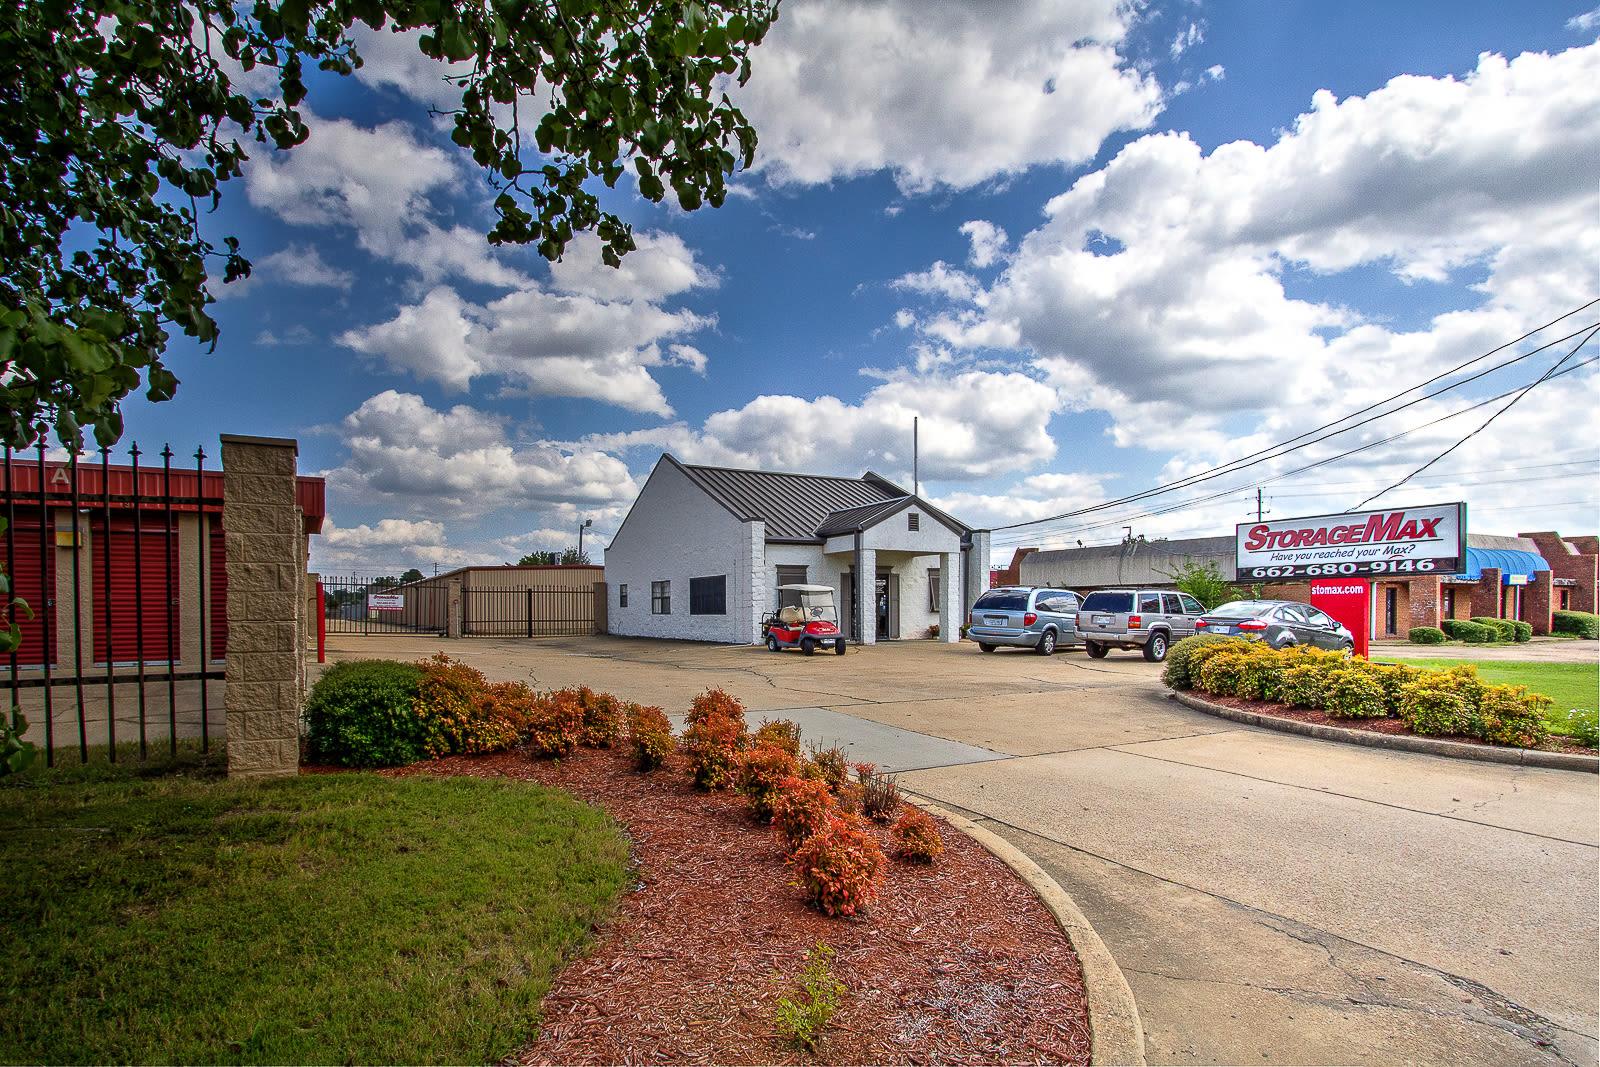 Self storage in Tupelo MS